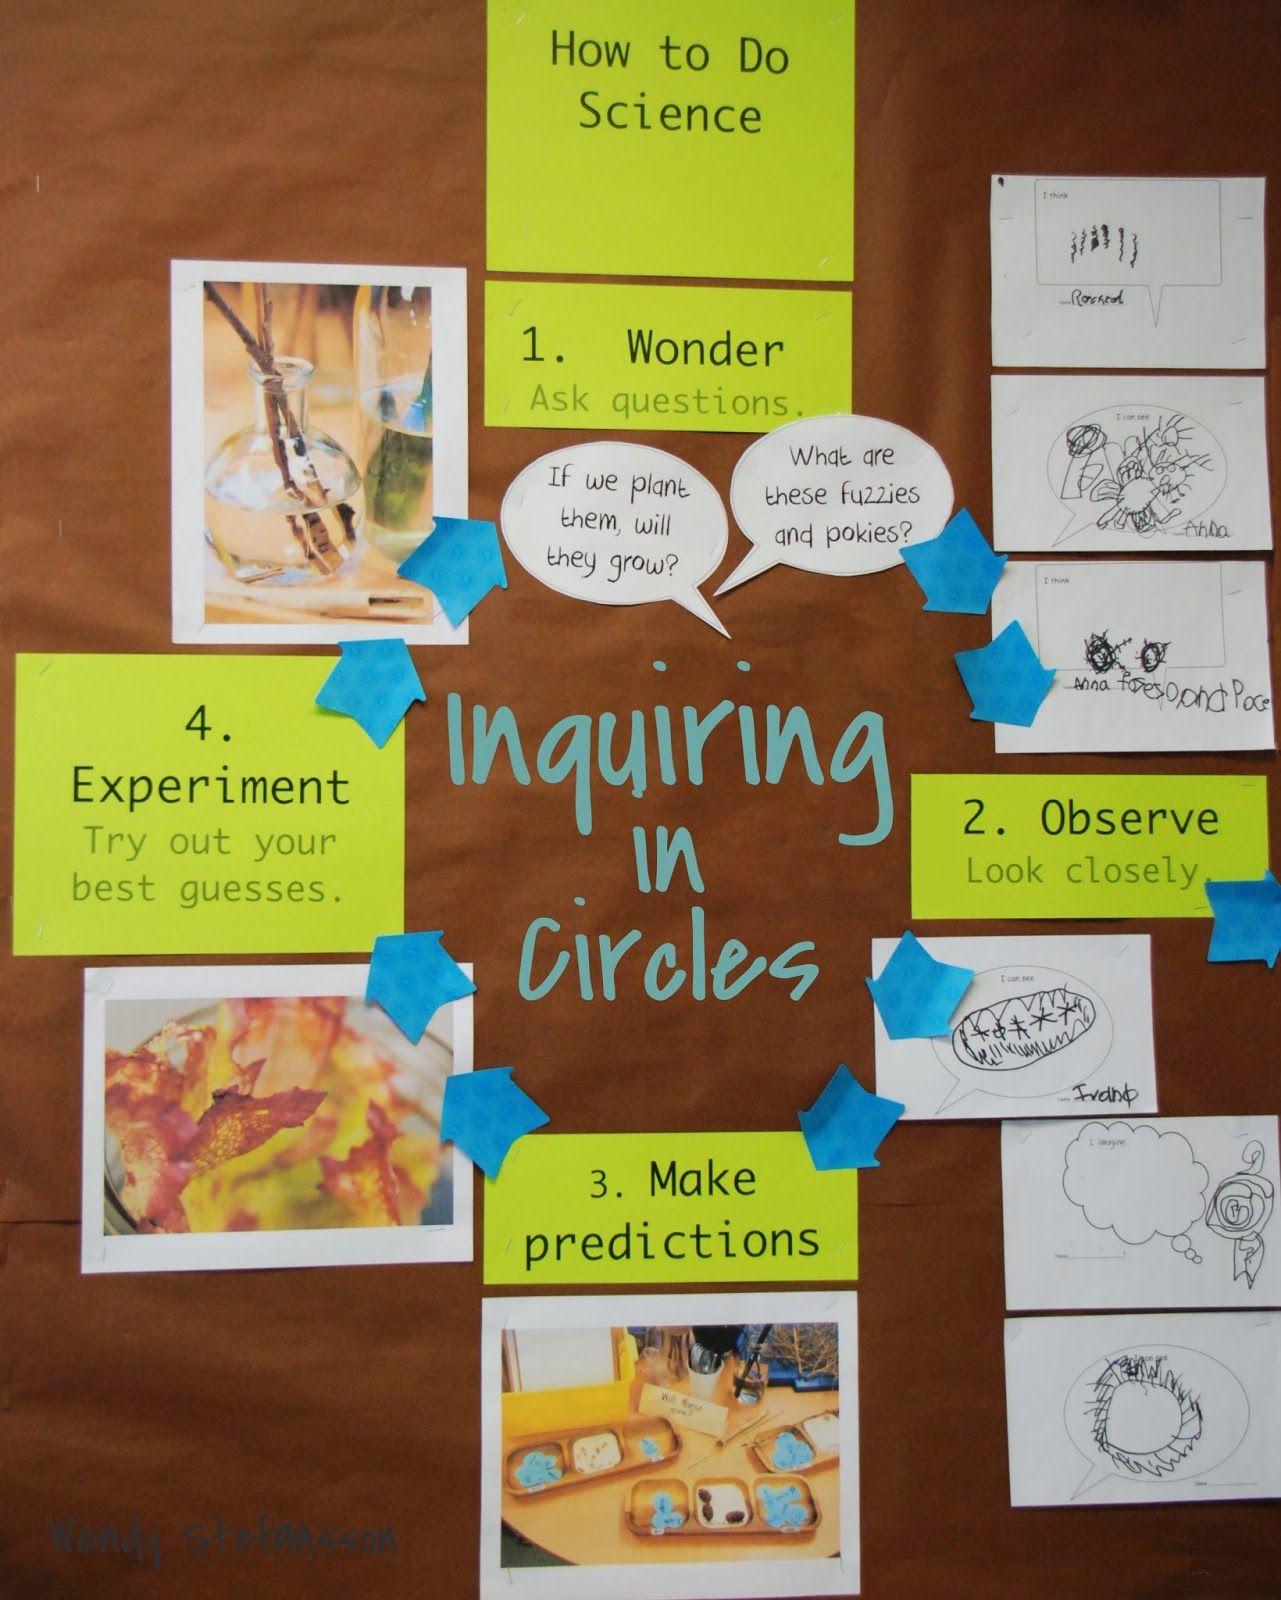 Inquiring in circles -- the scientific process as a spiral....